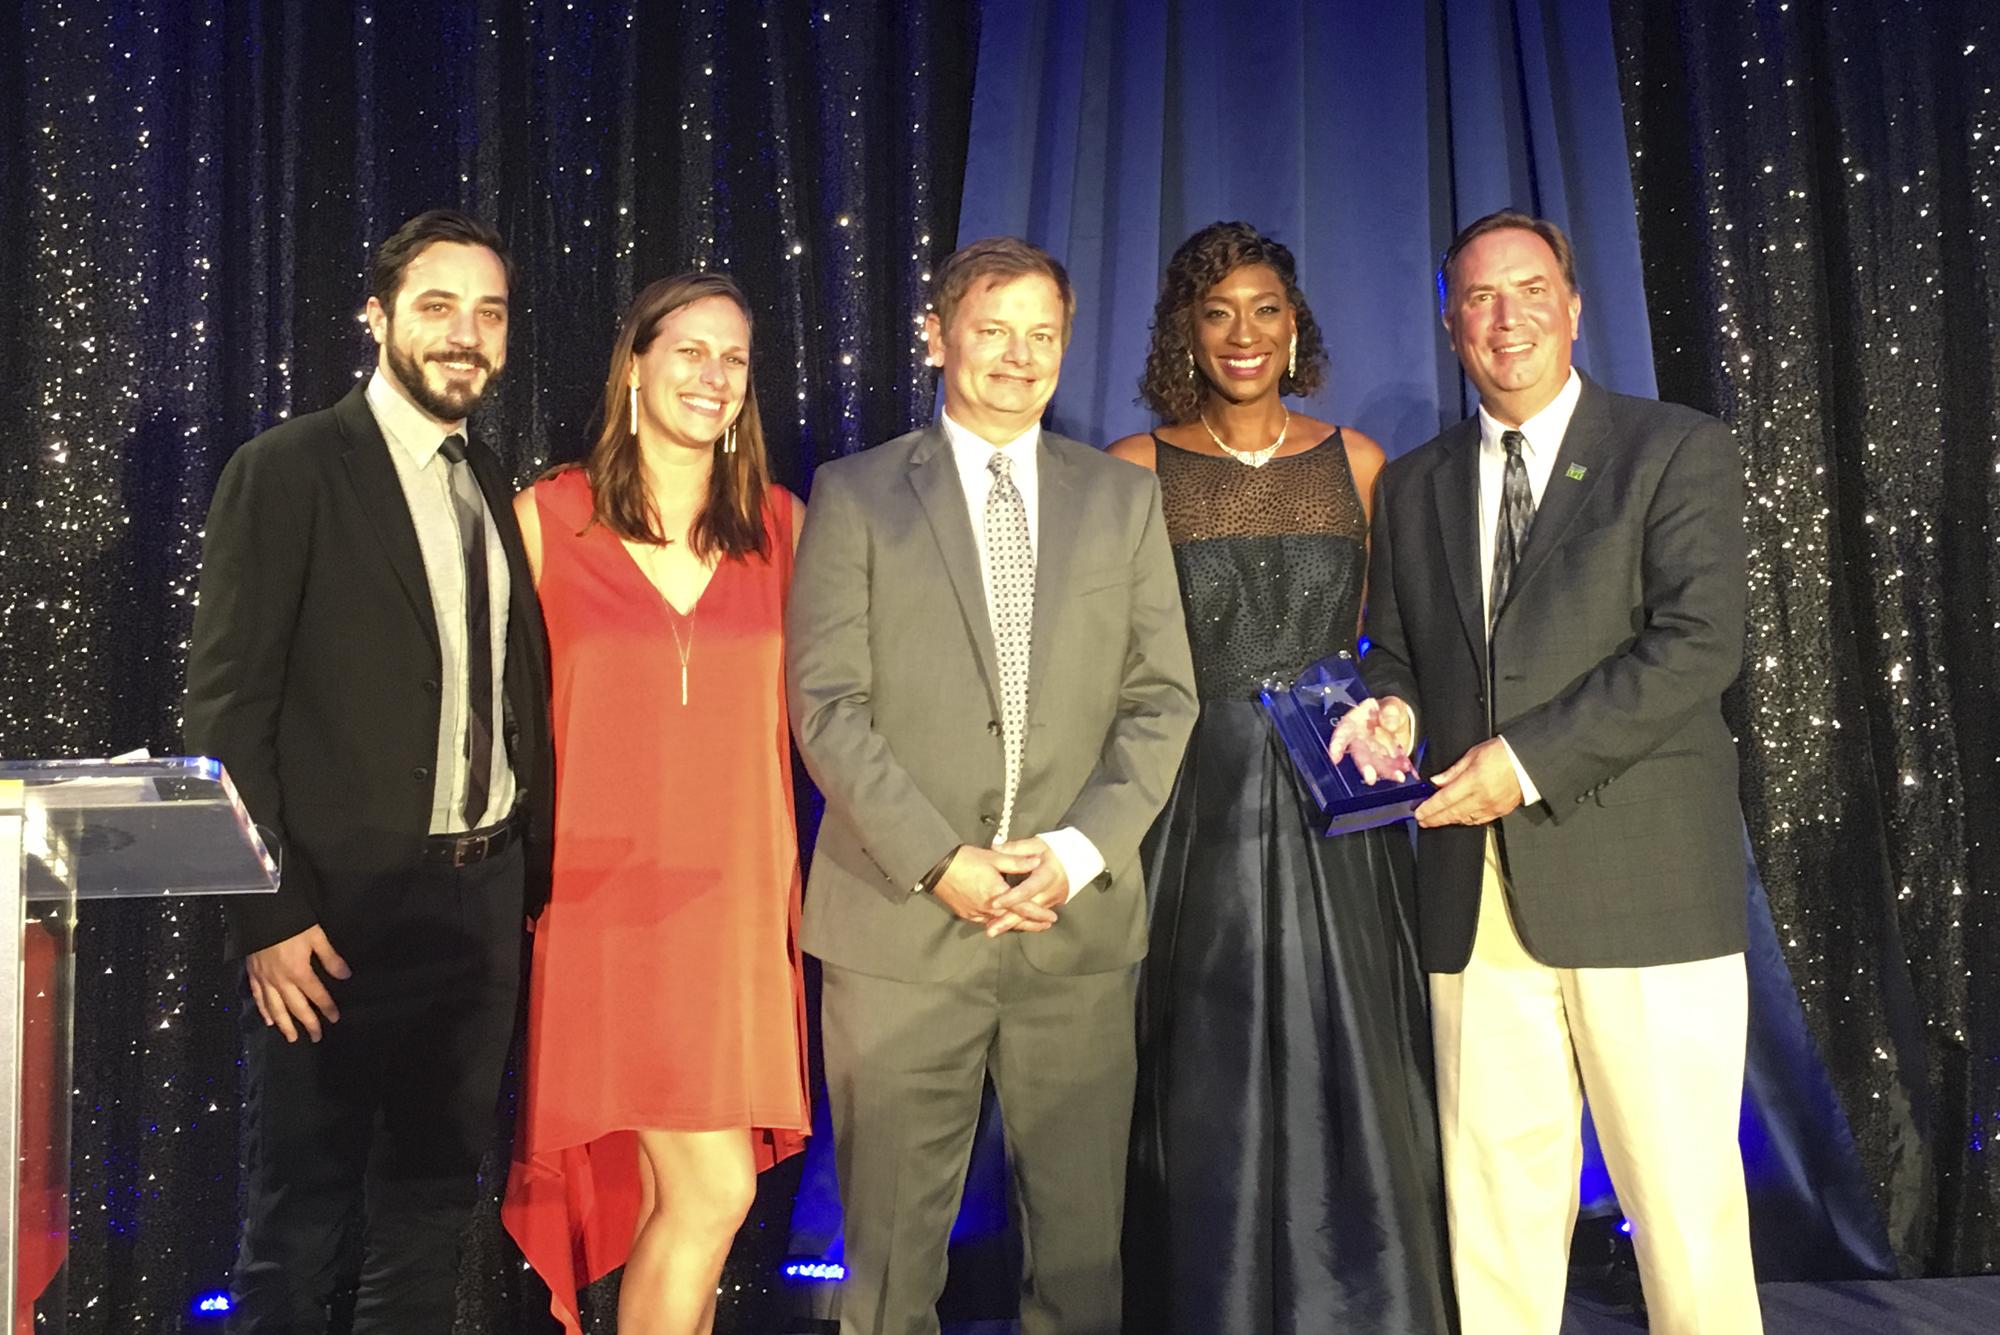 Design Awards - DMV Contractors - DC Area Award Winning Designers